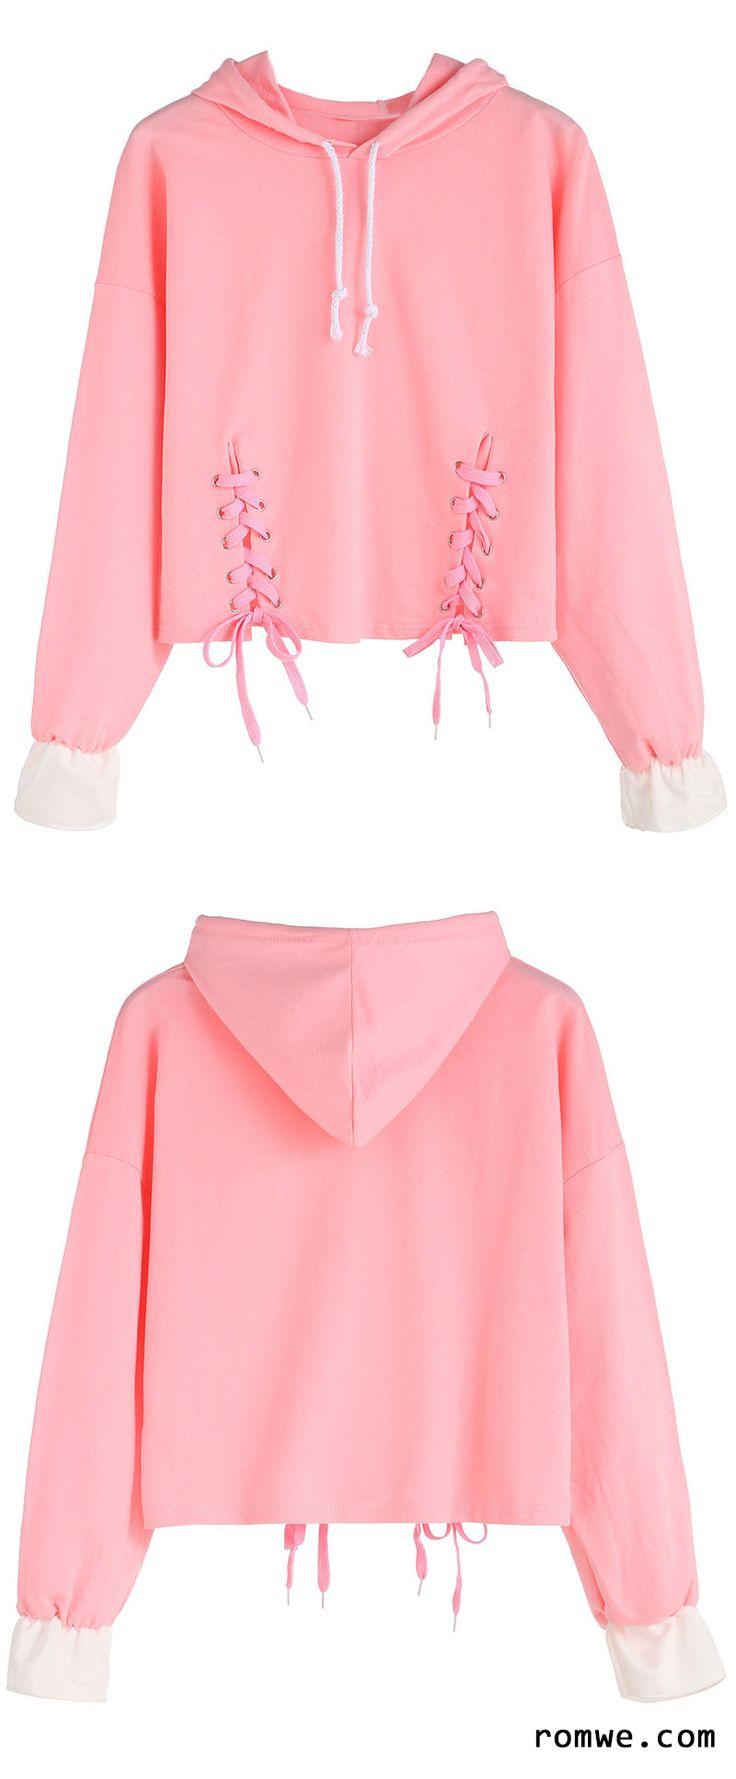 Pink Dropped Shoulder Seam Lace Up Drawstring Hooded Sweatshirt